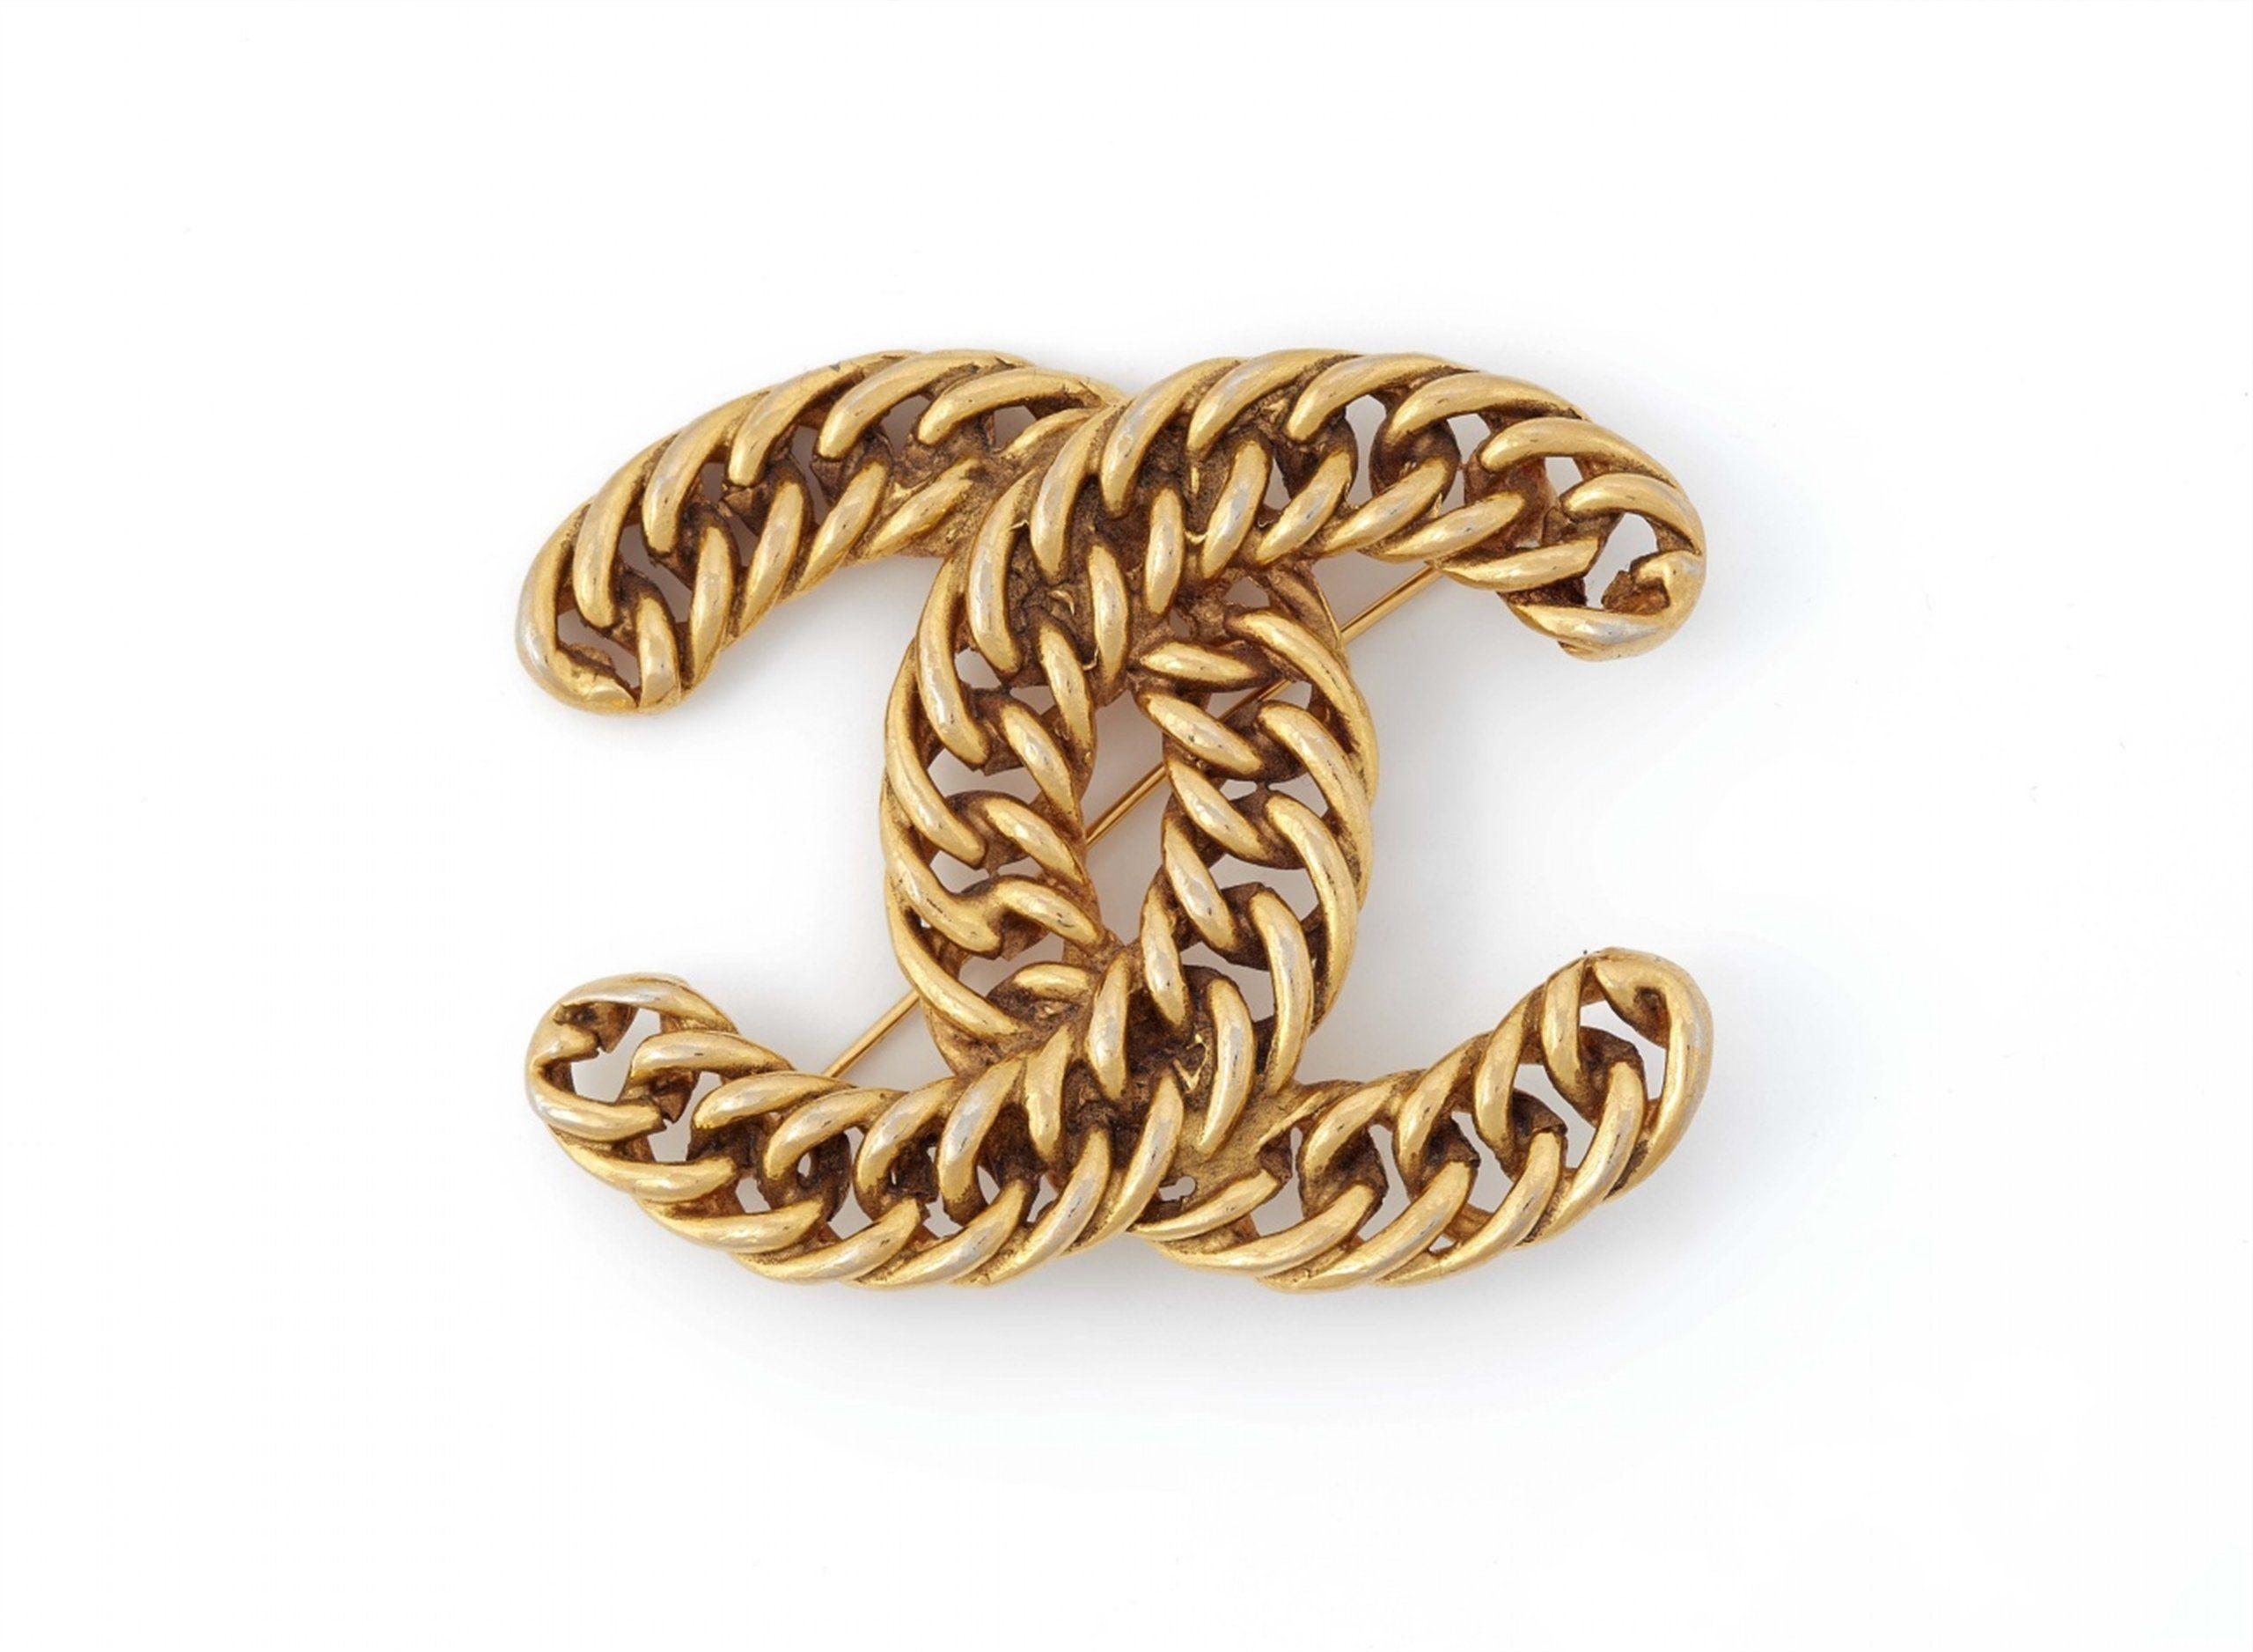 b3b4c86a Chanel, A Chanel logo brooch, 1982, Auction 1082 Hommage à ...